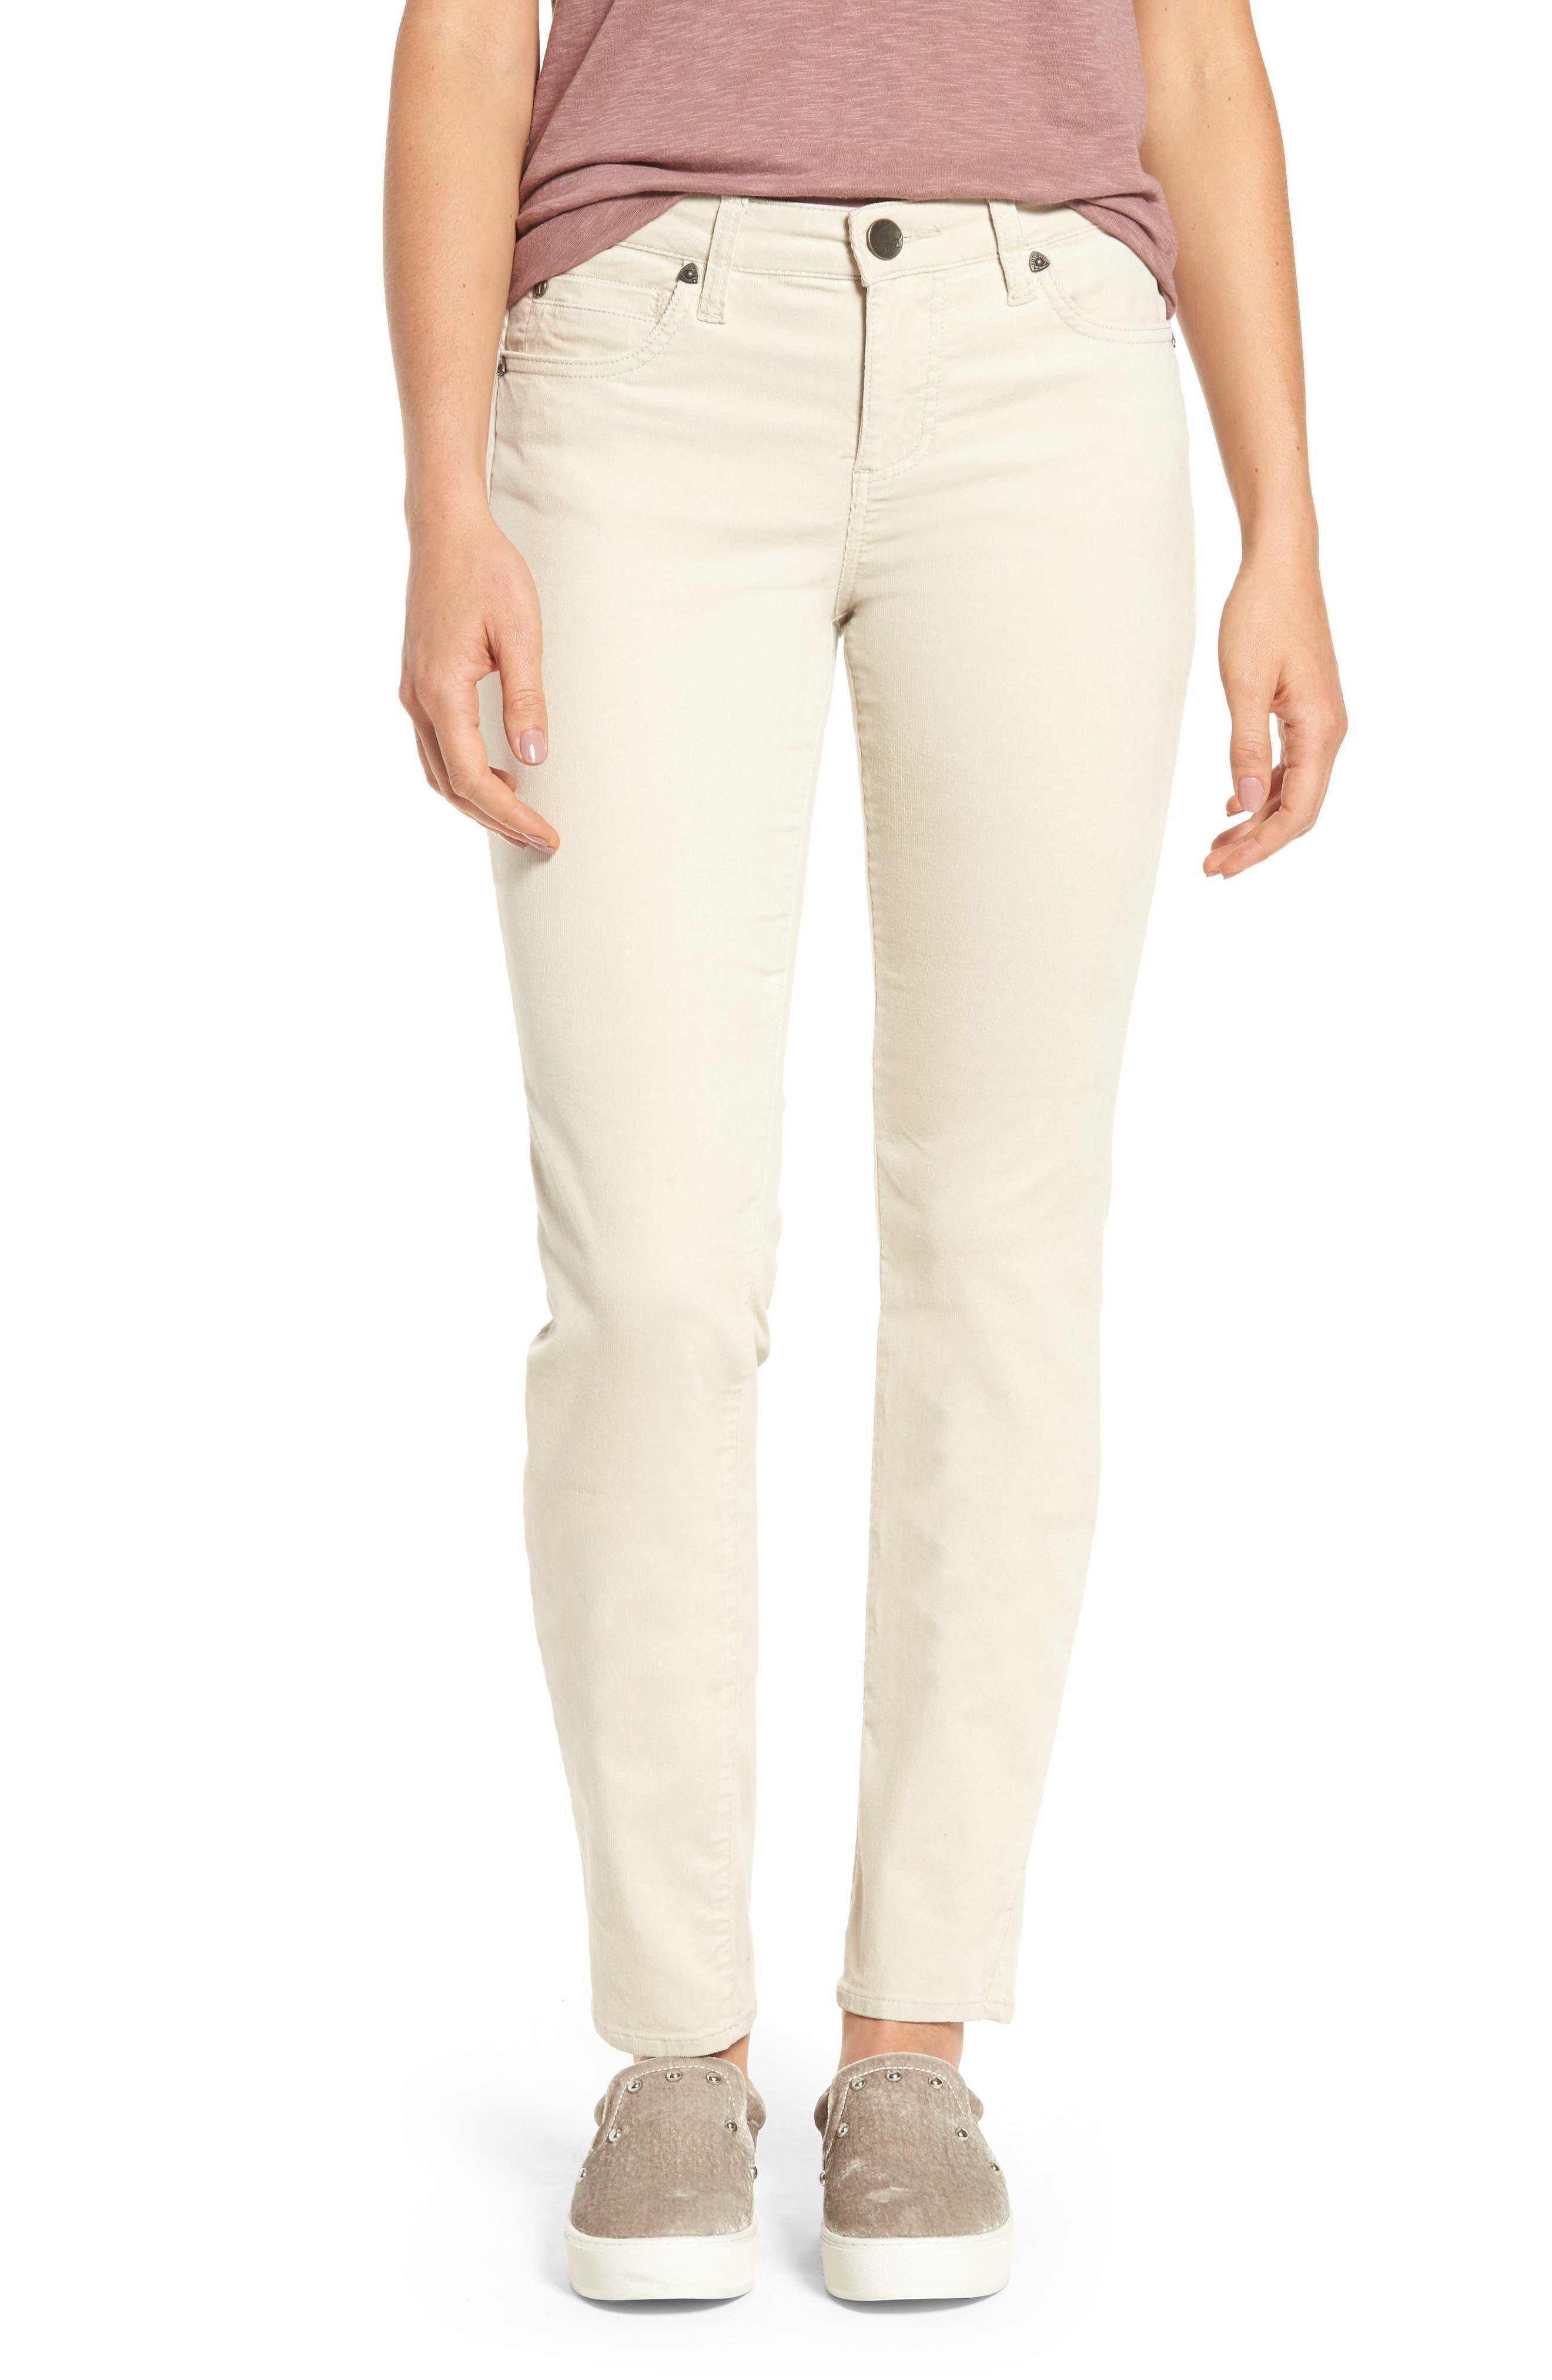 Diana Stretch Corduroy Skinny Pants,                             Main thumbnail 1, color,                             Light Tan 2